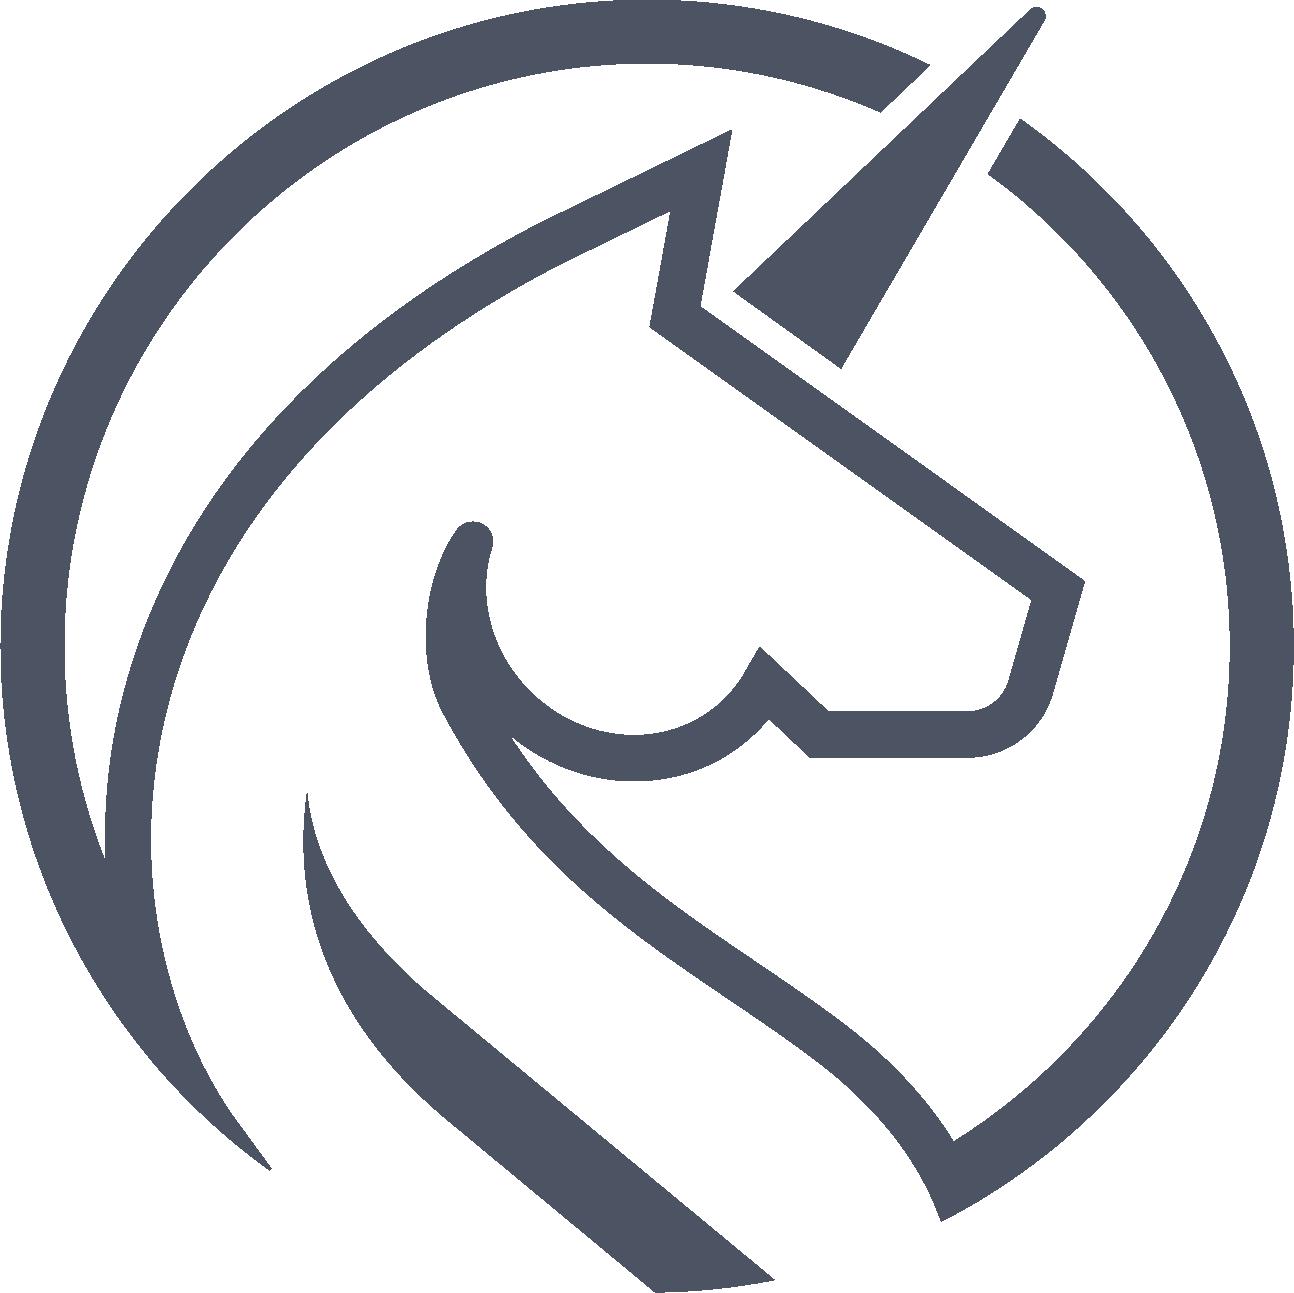 Unicorn favacon dark grey.png